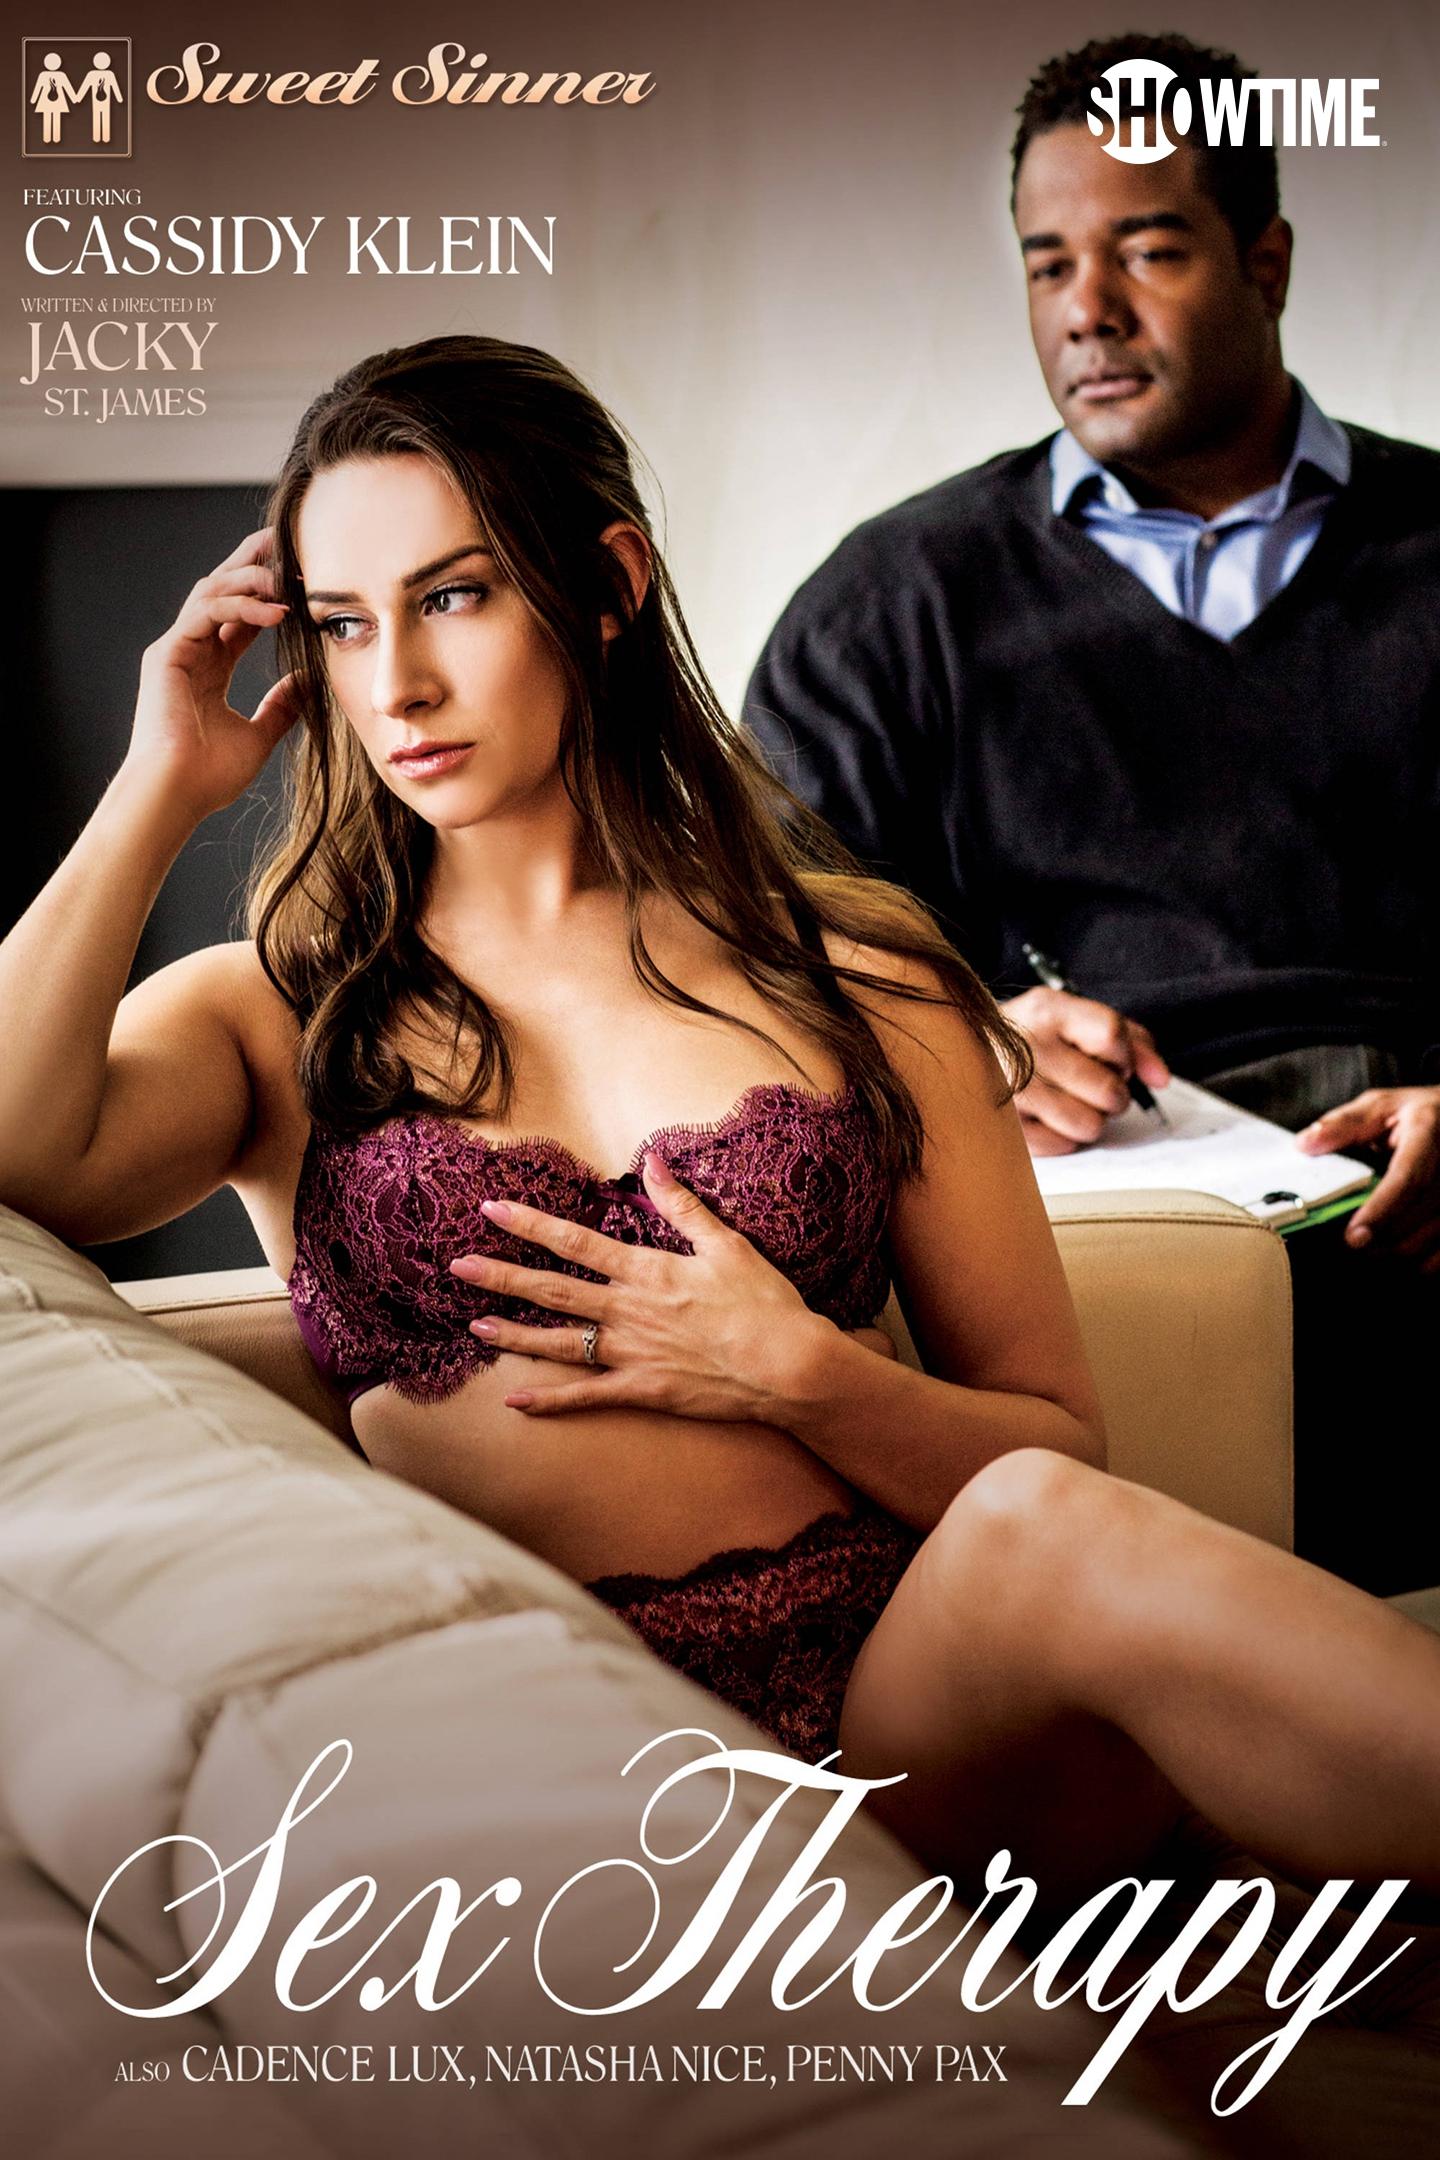 Online sex channels